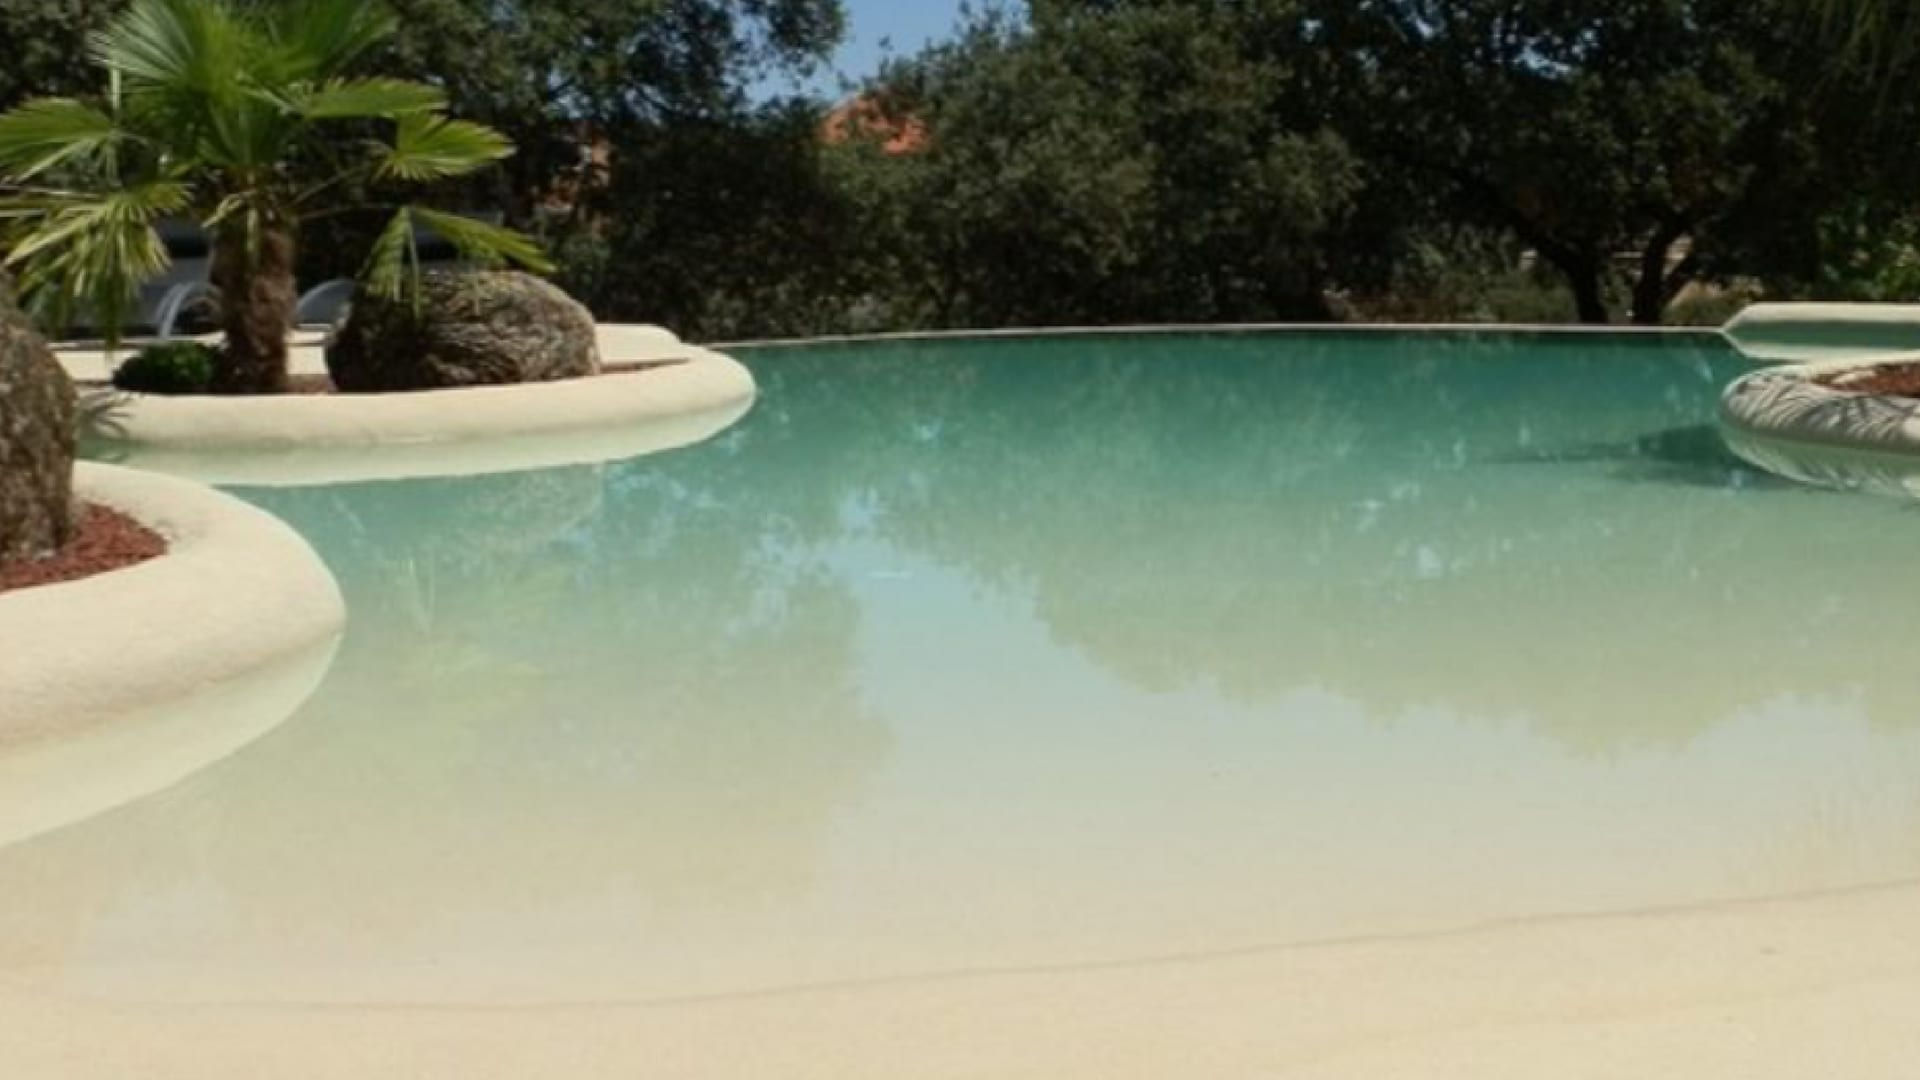 alarme piscine lagon. Black Bedroom Furniture Sets. Home Design Ideas